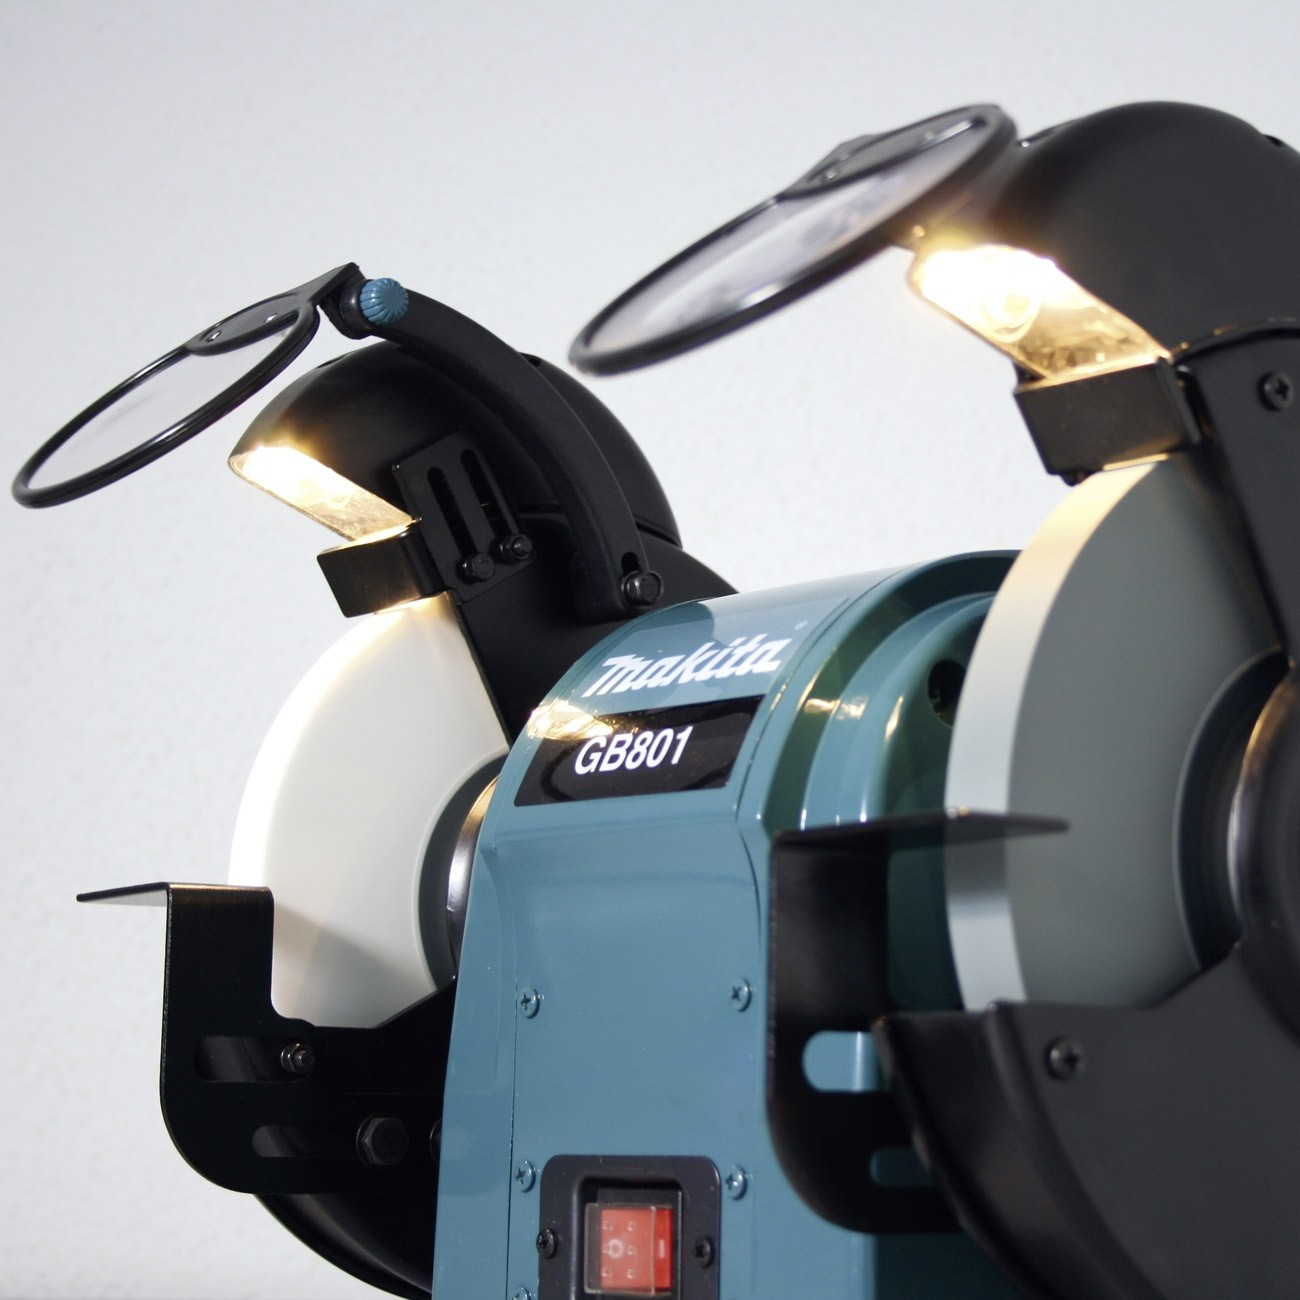 Makita Doppelschleifer GB 801 Schleifmaschine Schleifgerät Doppelschleifbock 16016